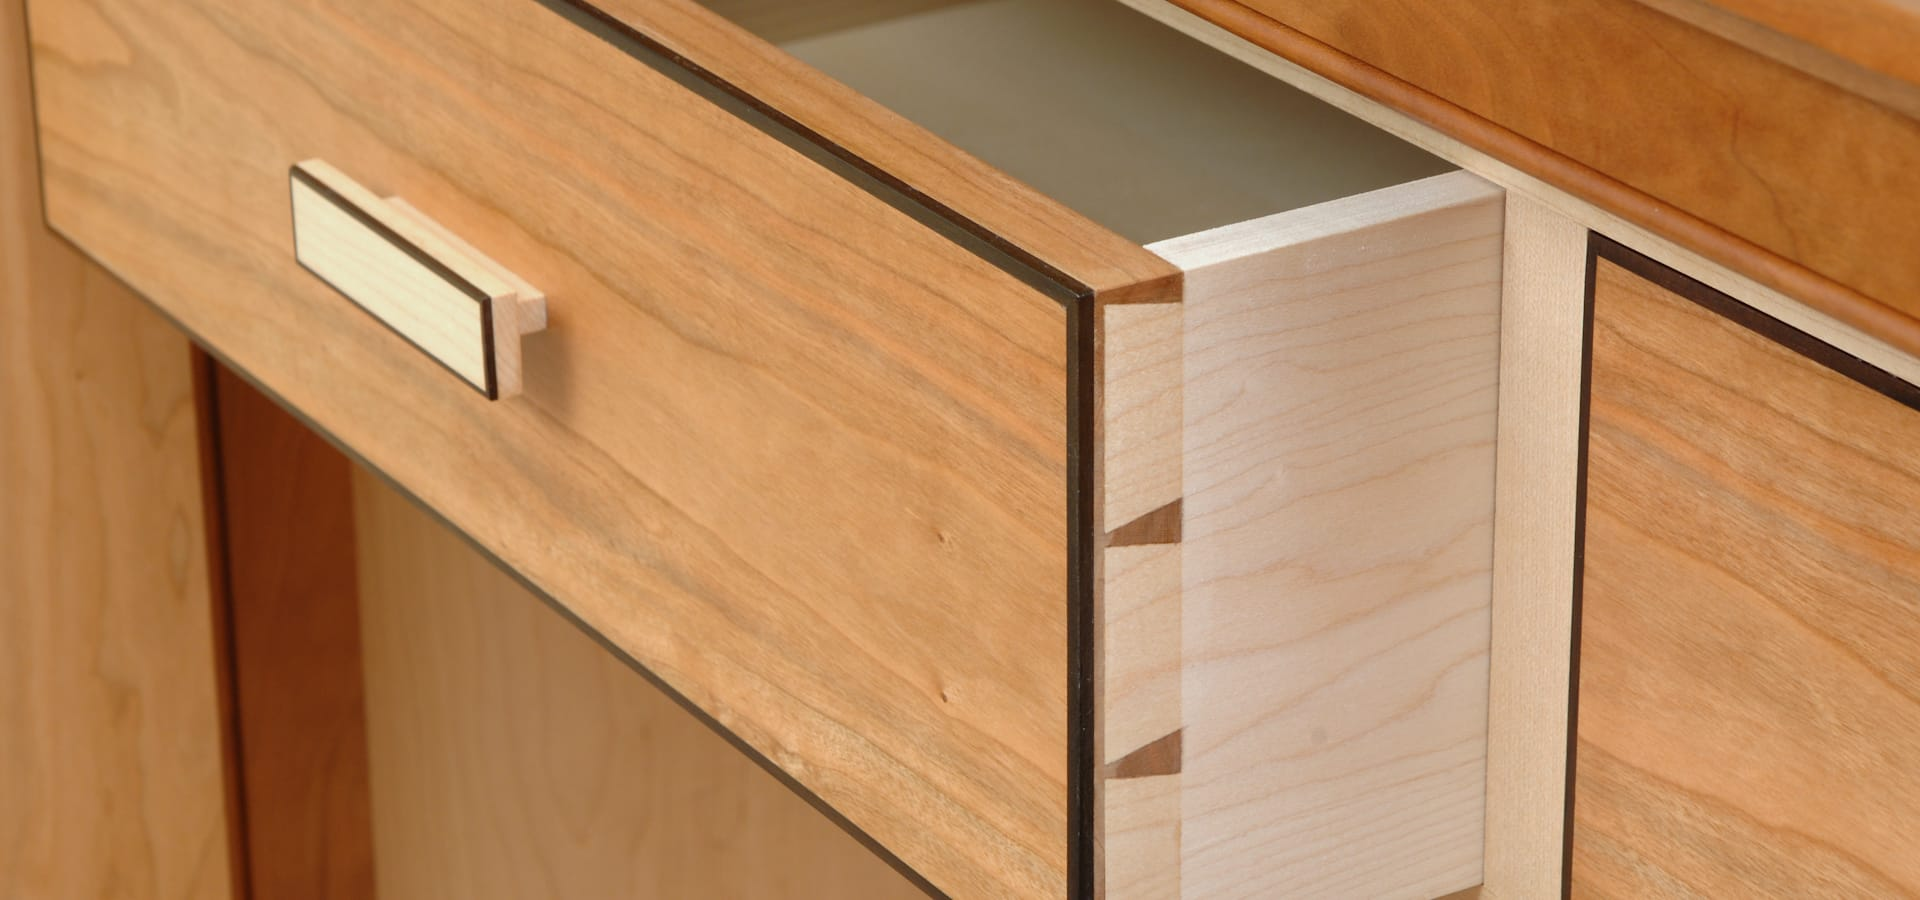 Martin Greshoff Furniture